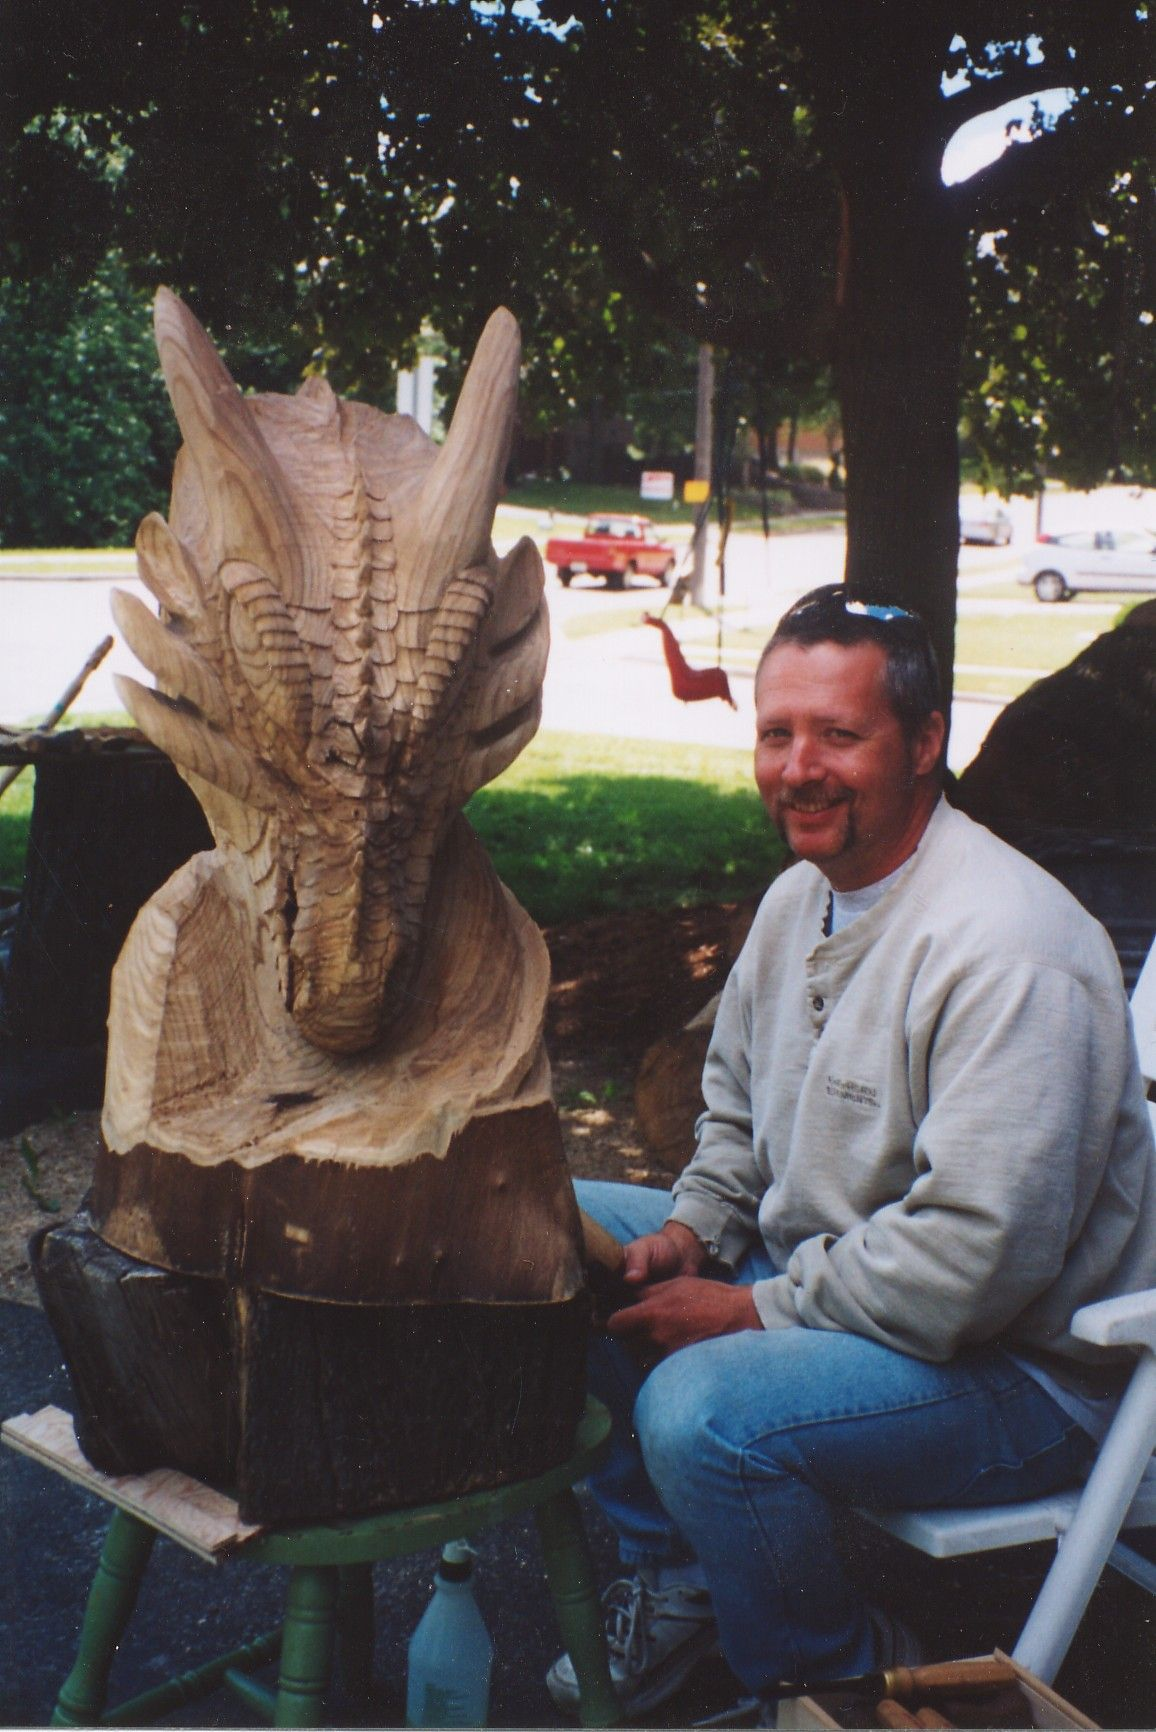 Paul frenette carving dragon декор фунд. цоколь pinterest